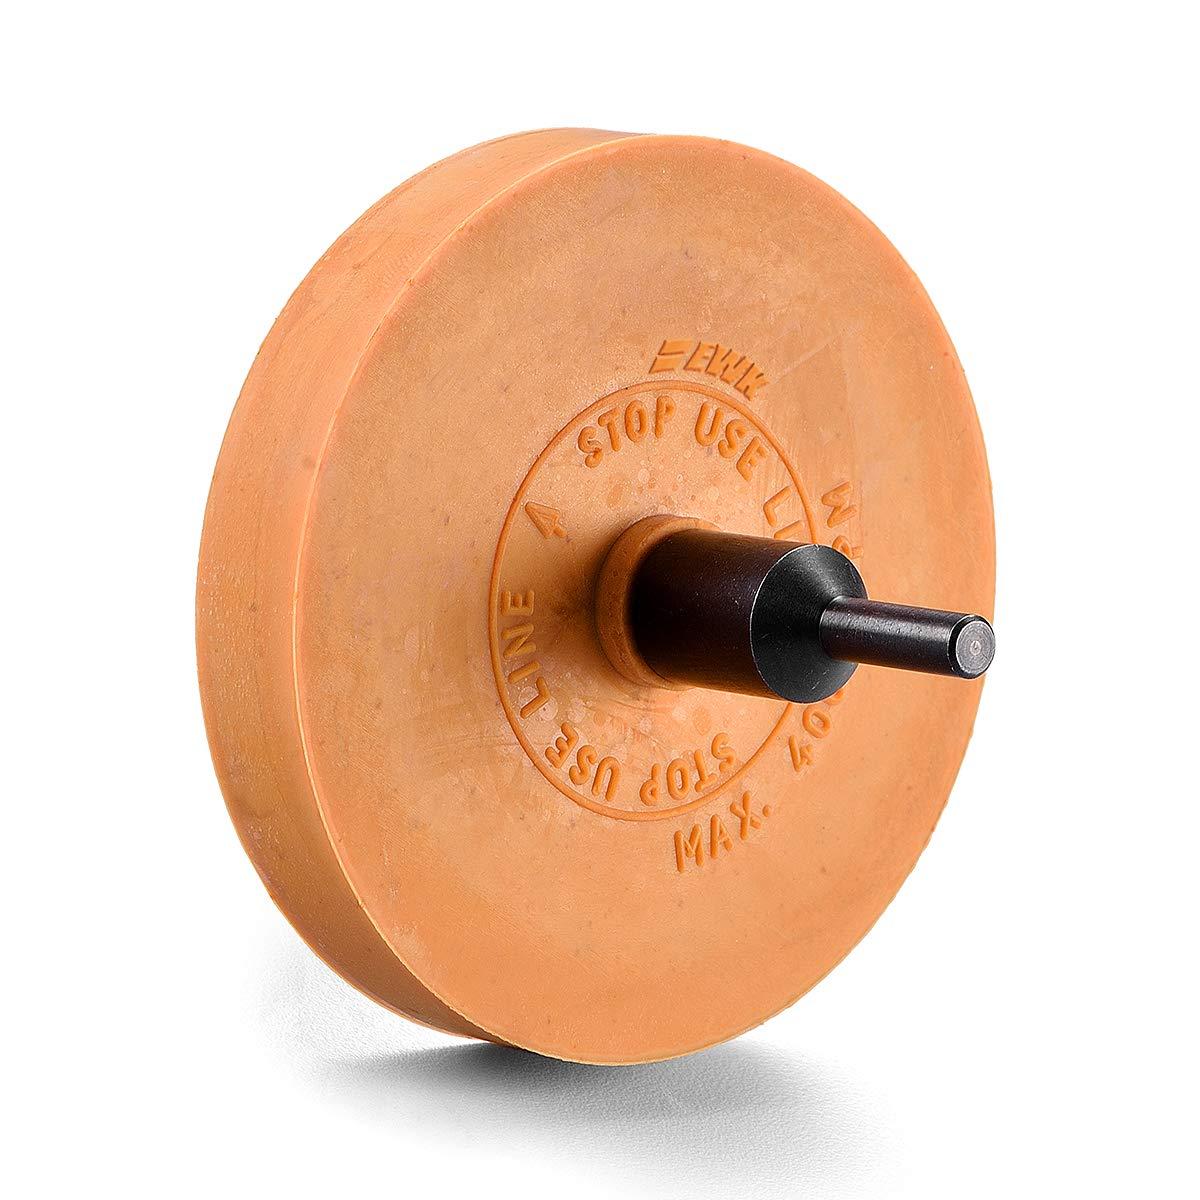 EWK Rubber Eraser Wheel Decal Vinyl Sticker Adhesive Remover Pinstripe Removal Tool Pad /& Adapter EB0153